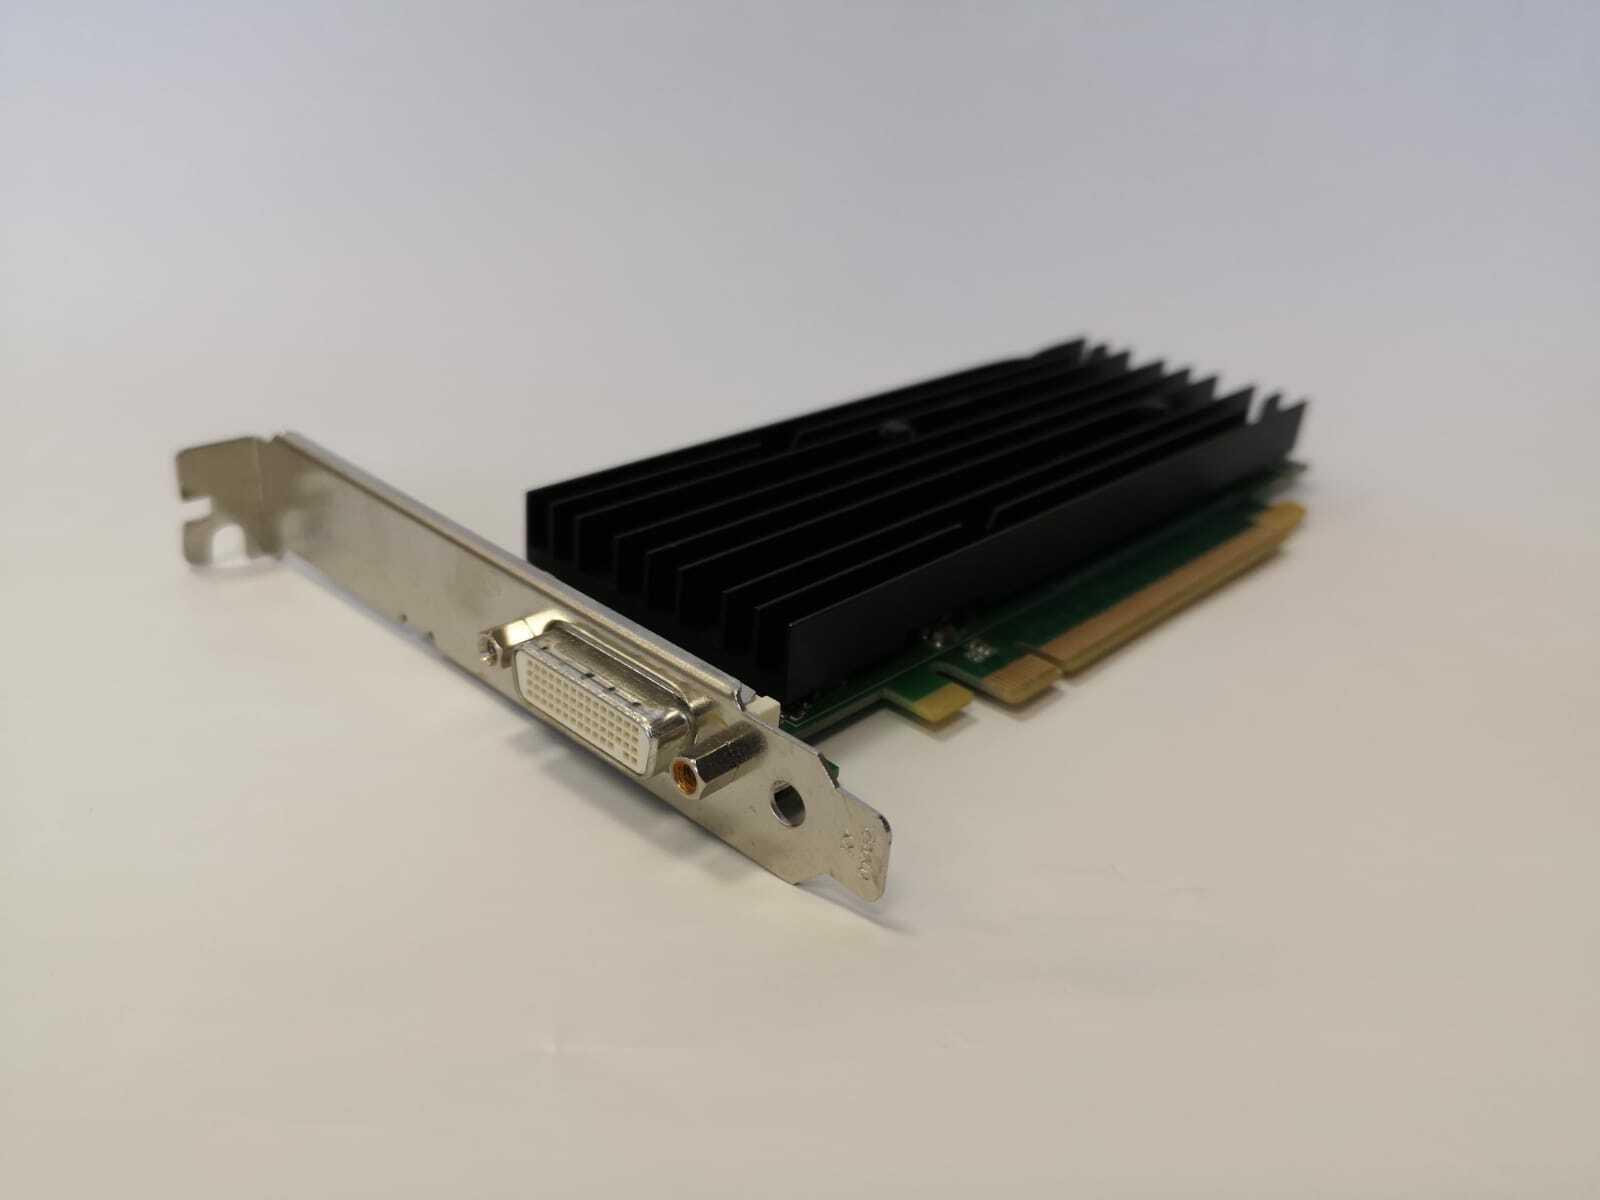 nVIDIA Quadro NVS 290 Grafikkarte 2x DVI PCIe x1 Dual Link GPU 256 MB